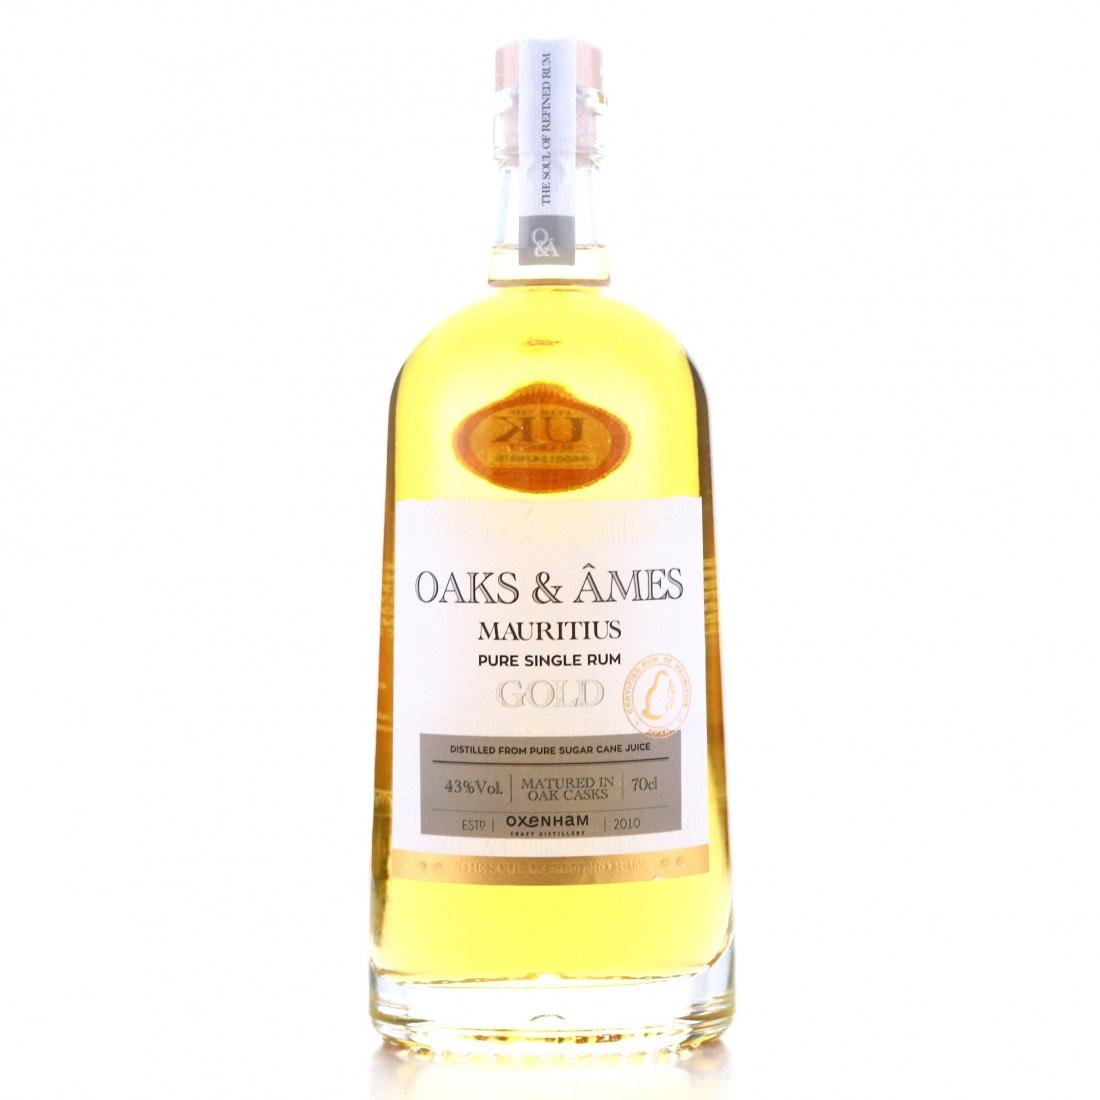 Bottle image of Oaks & Âmes Gold Rum